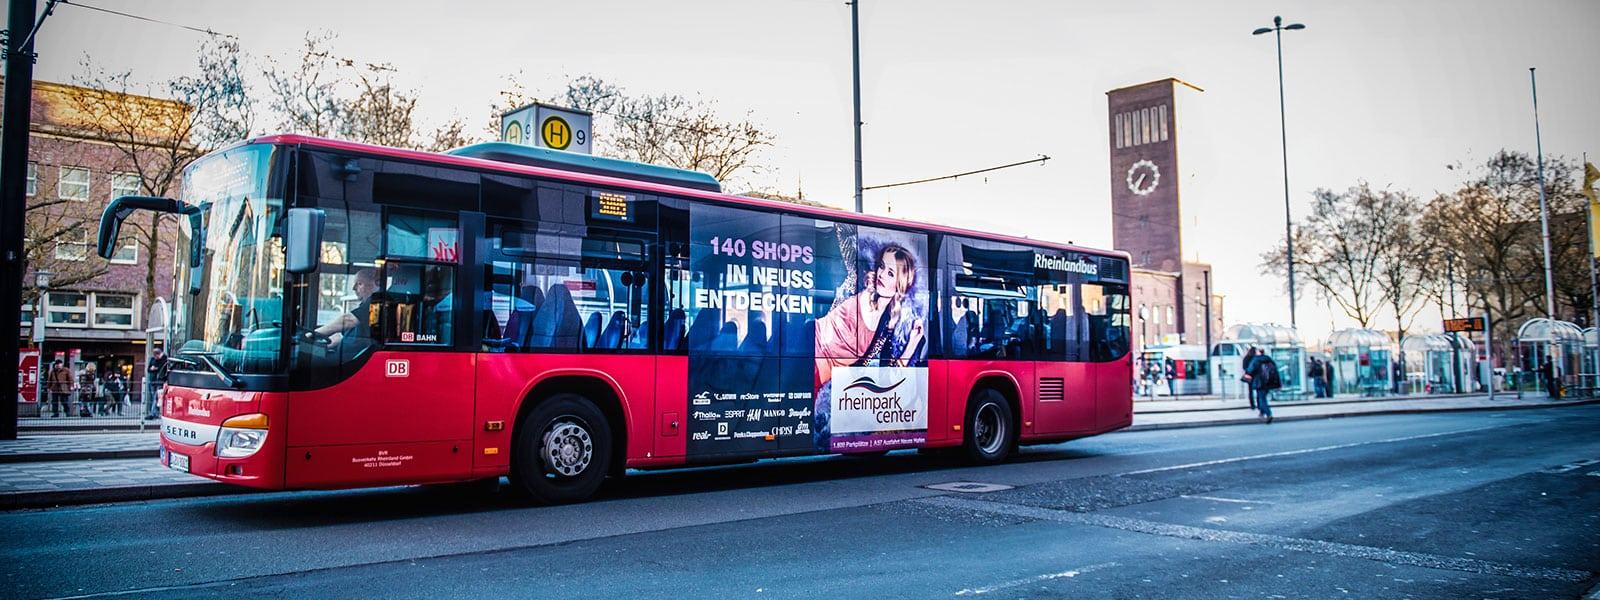 Dortmund-Verkehrsmittelwerbung-Bus-Traffic-Board